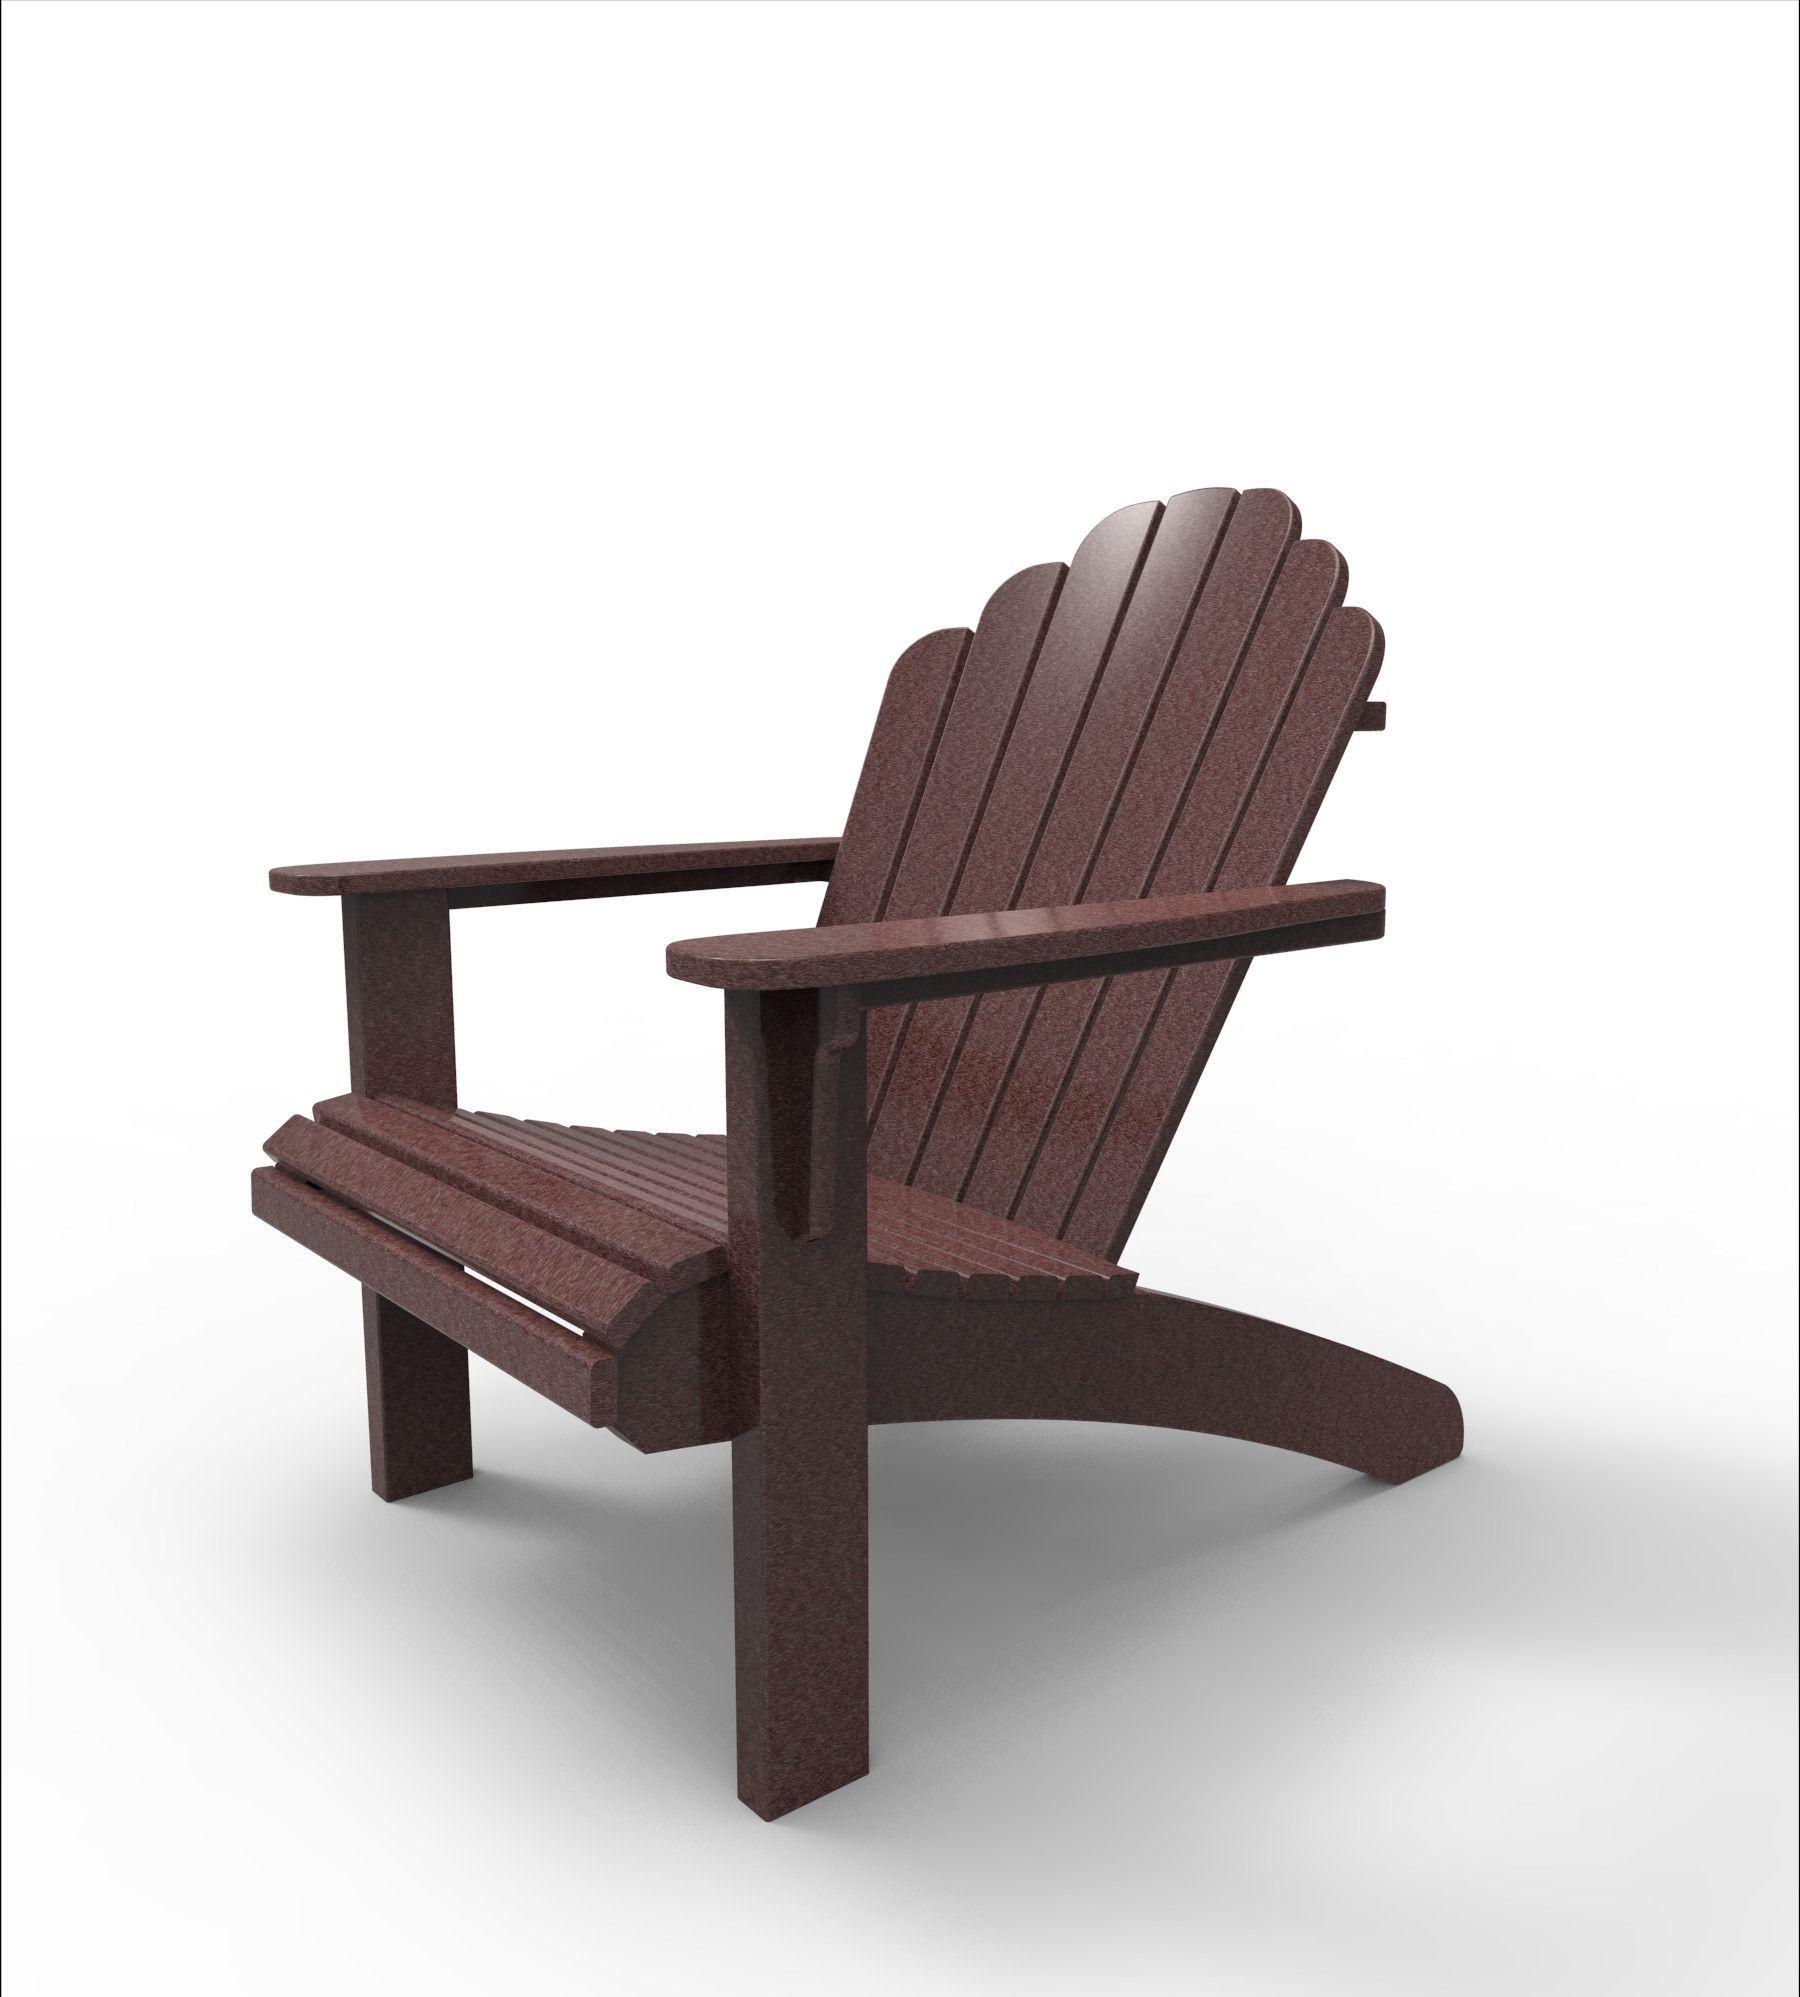 Malibu Outdoor Living Recycled Plastic Hampton Adirondack Chair